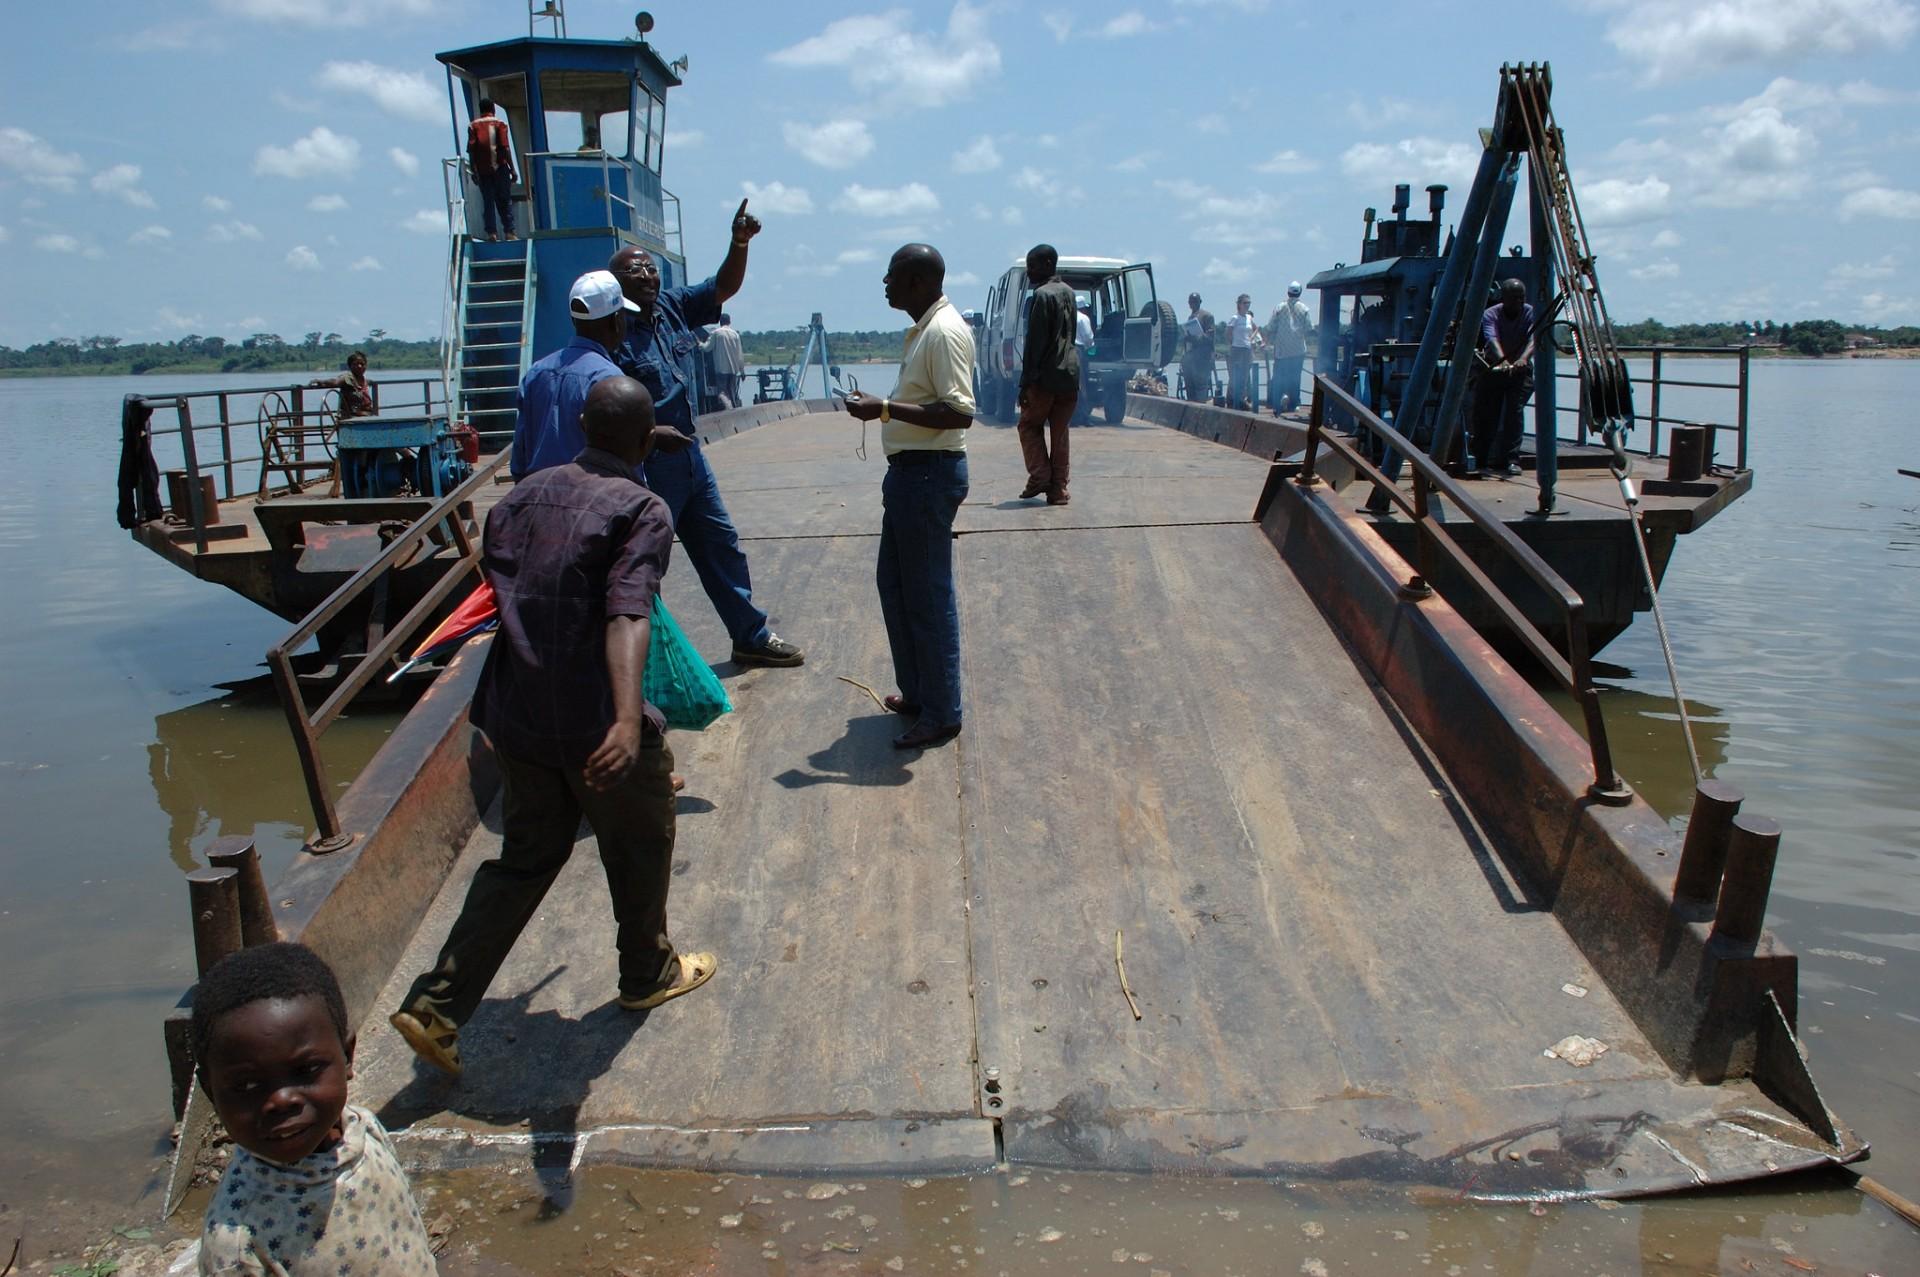 Crossing the Congo (c) Julien Harneis